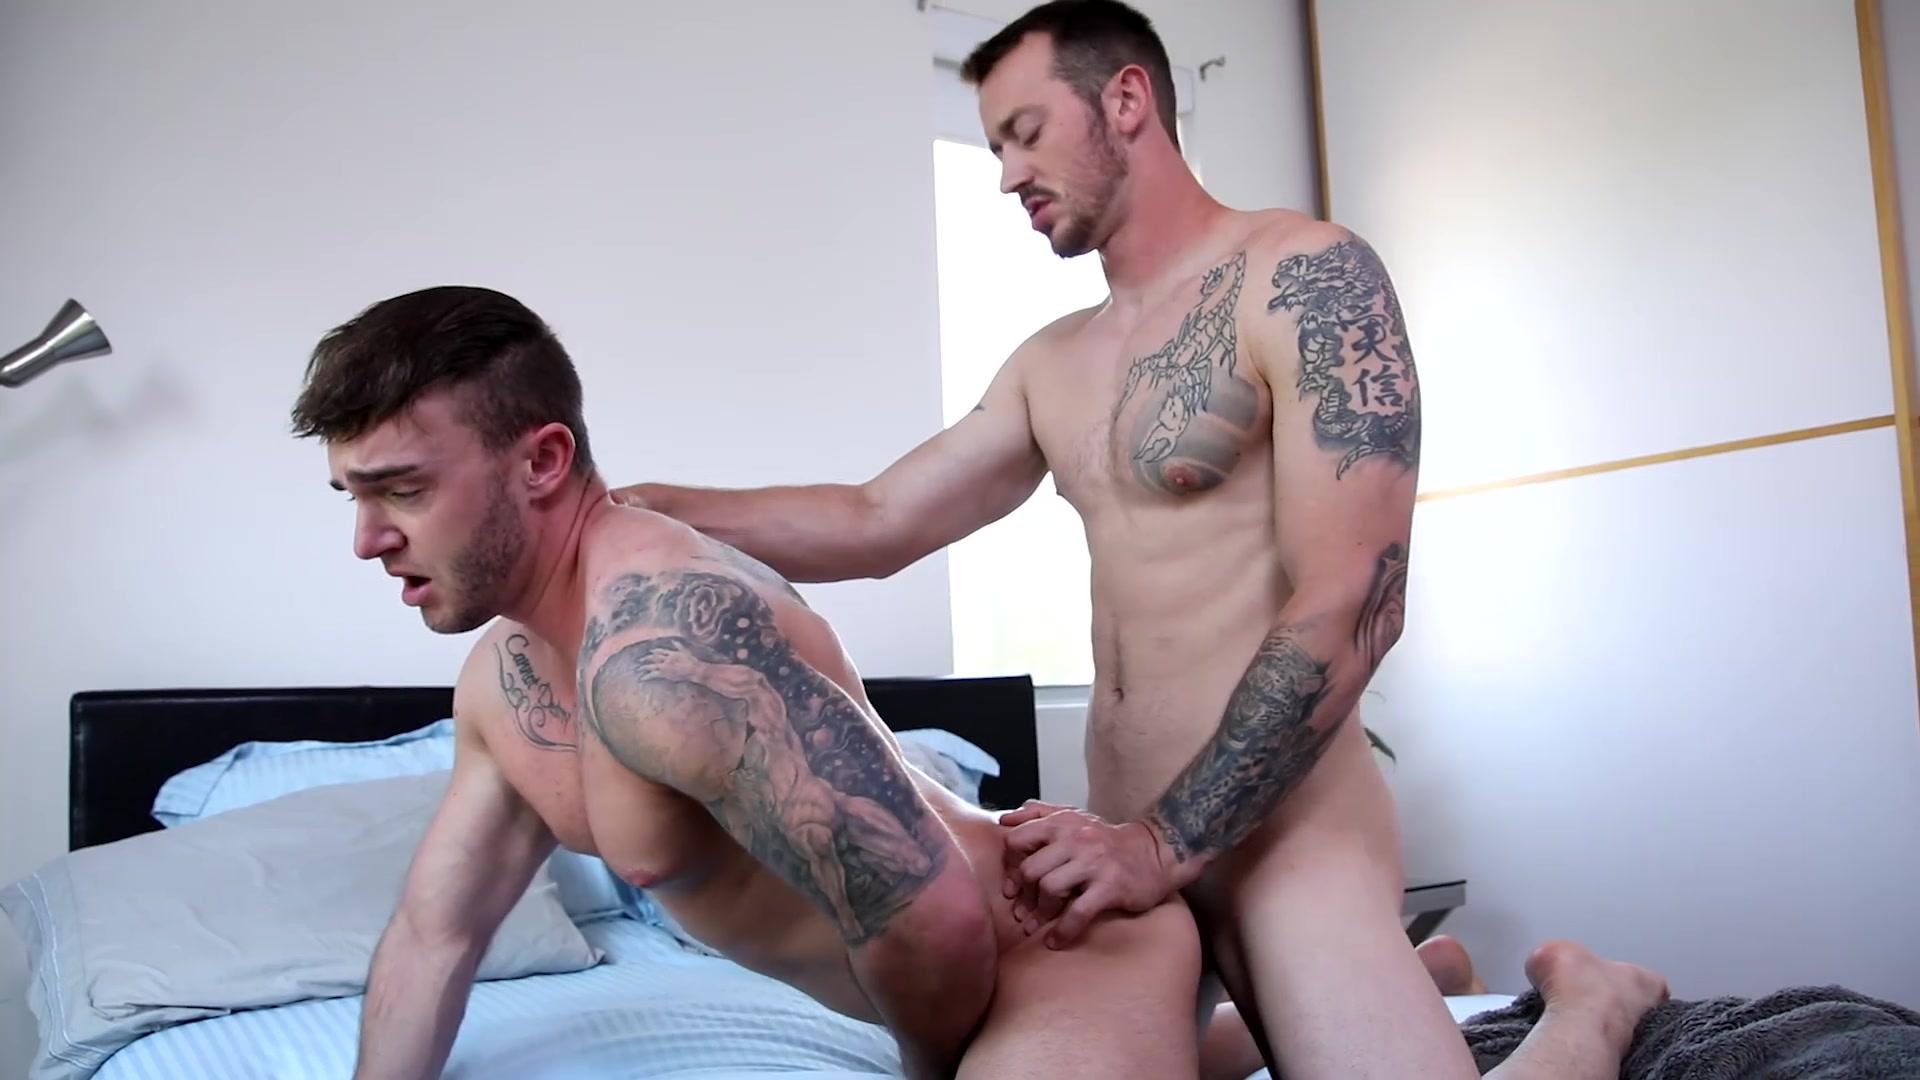 sexe gay film gratuit